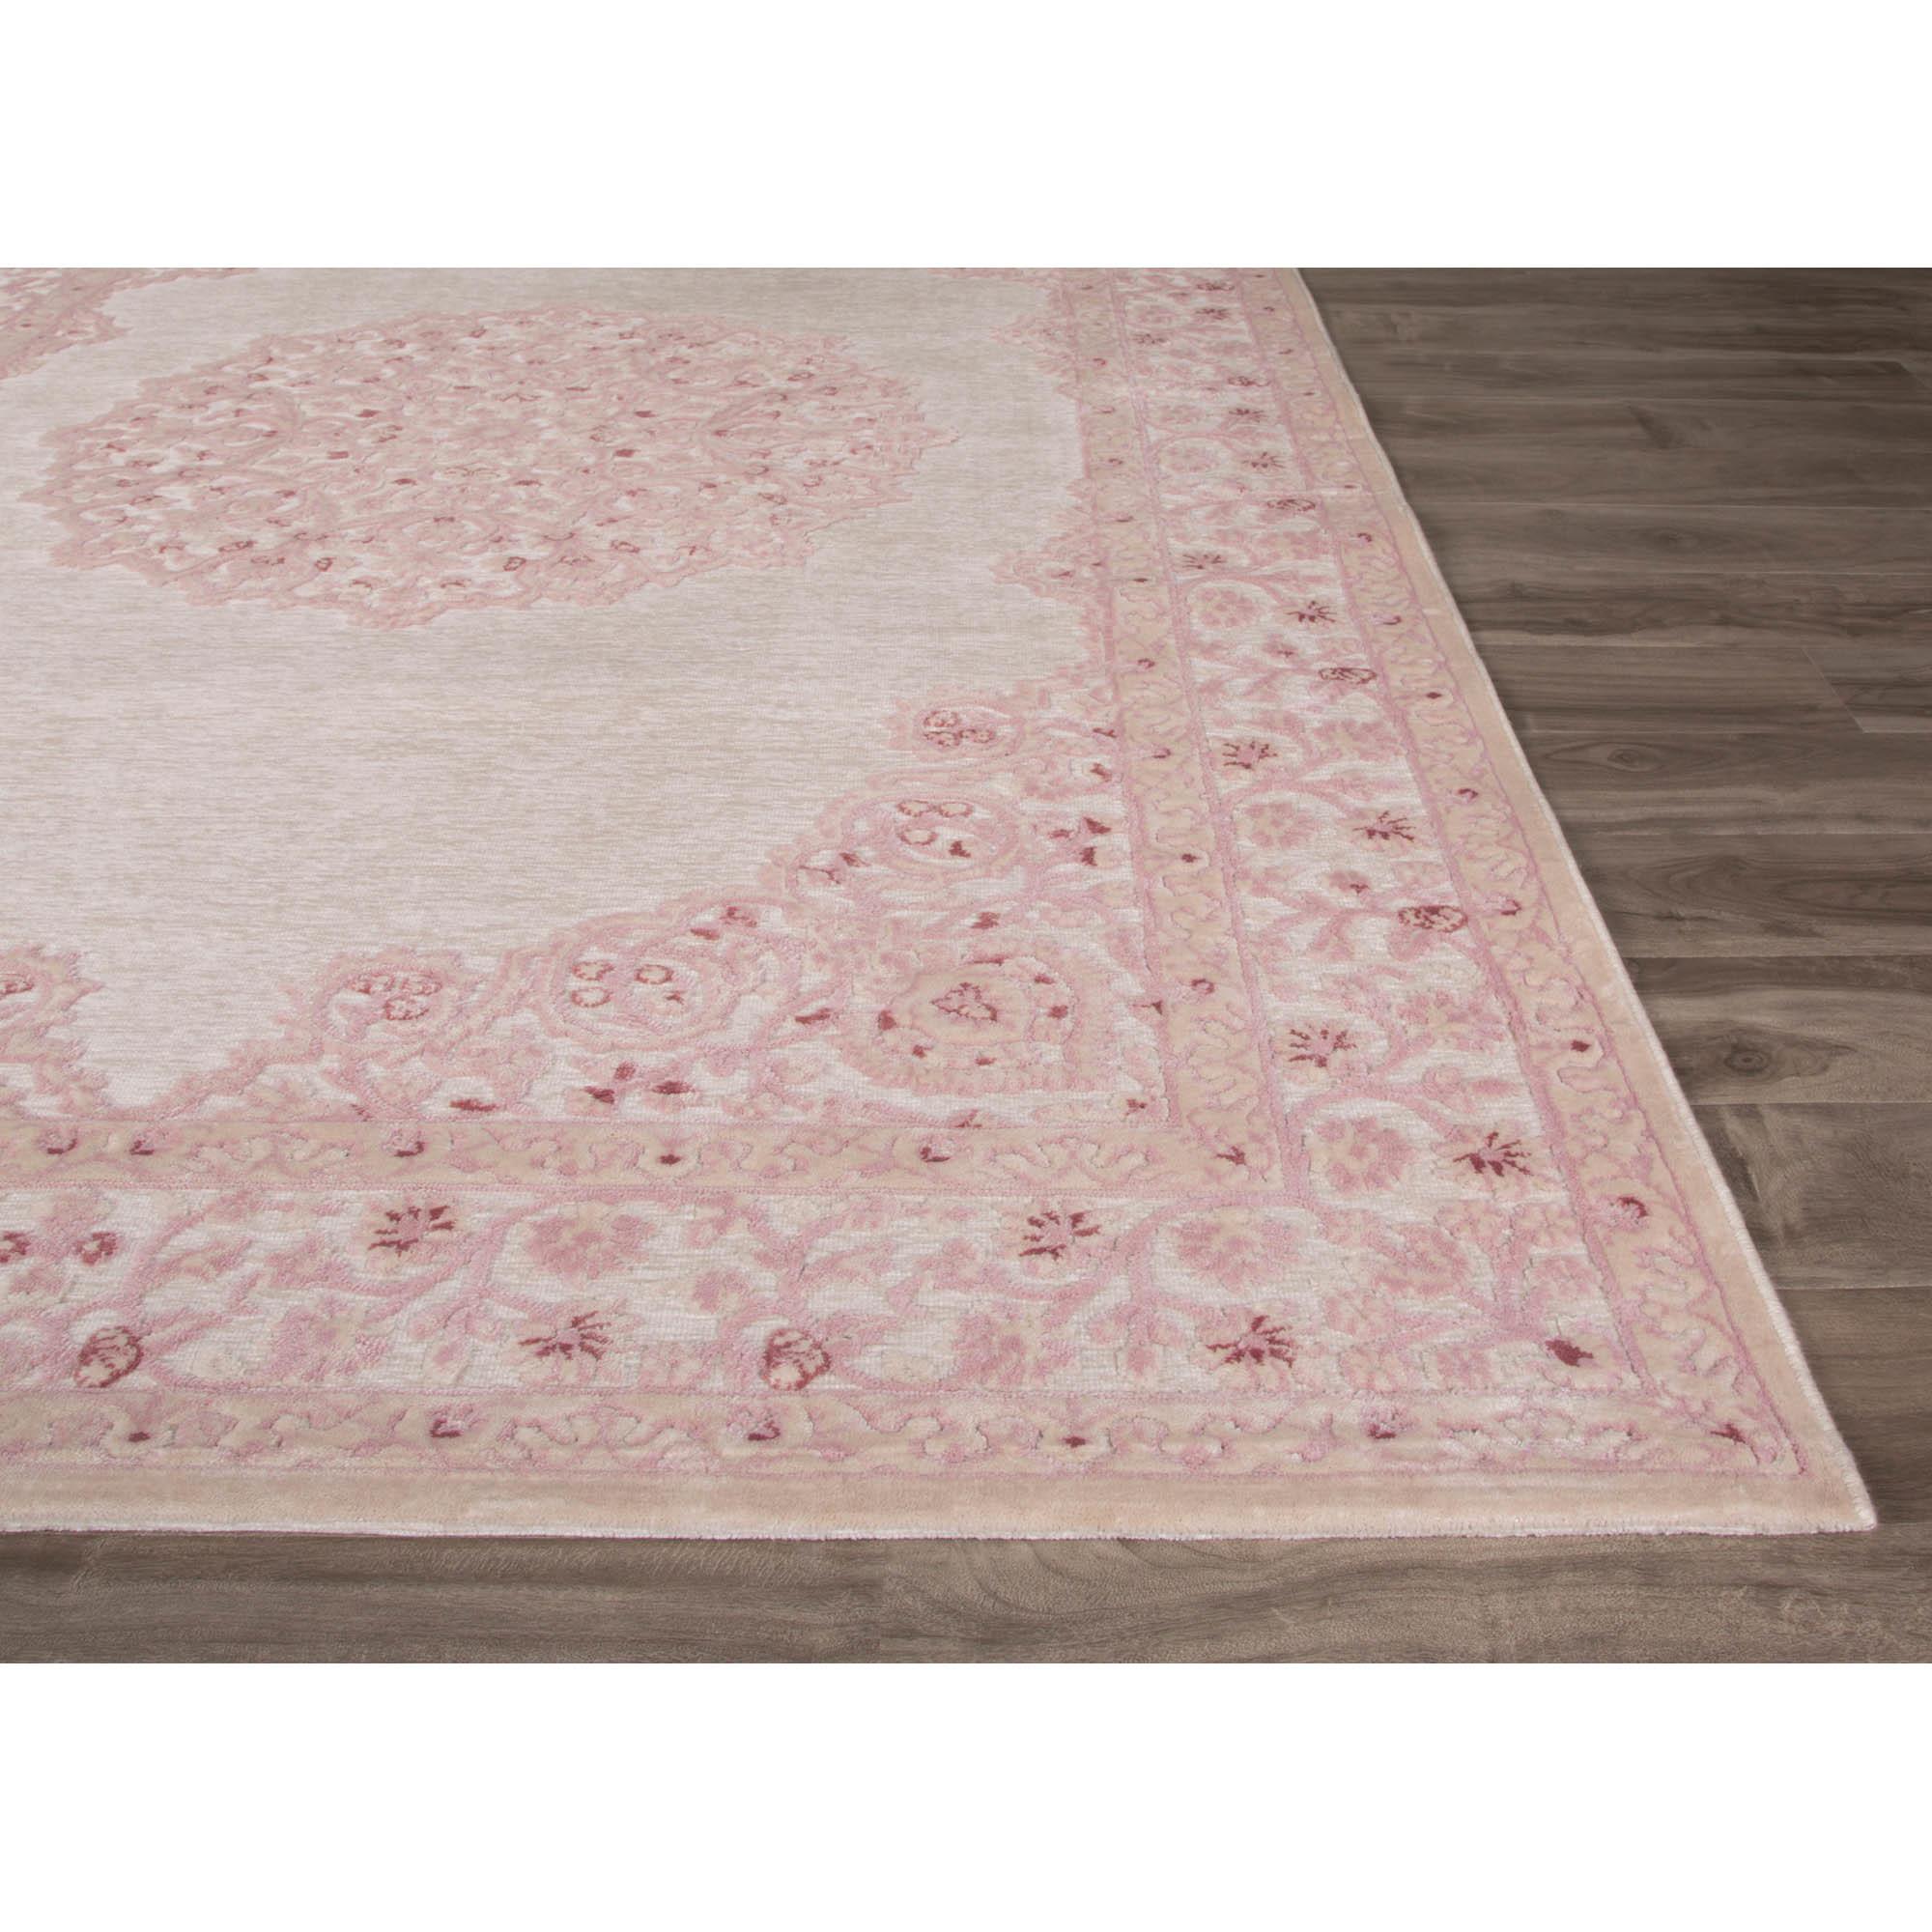 Cozy ... Pink Area Rug · Lark Manoru0026trade; Alamosa Ivory - ... pink area rug